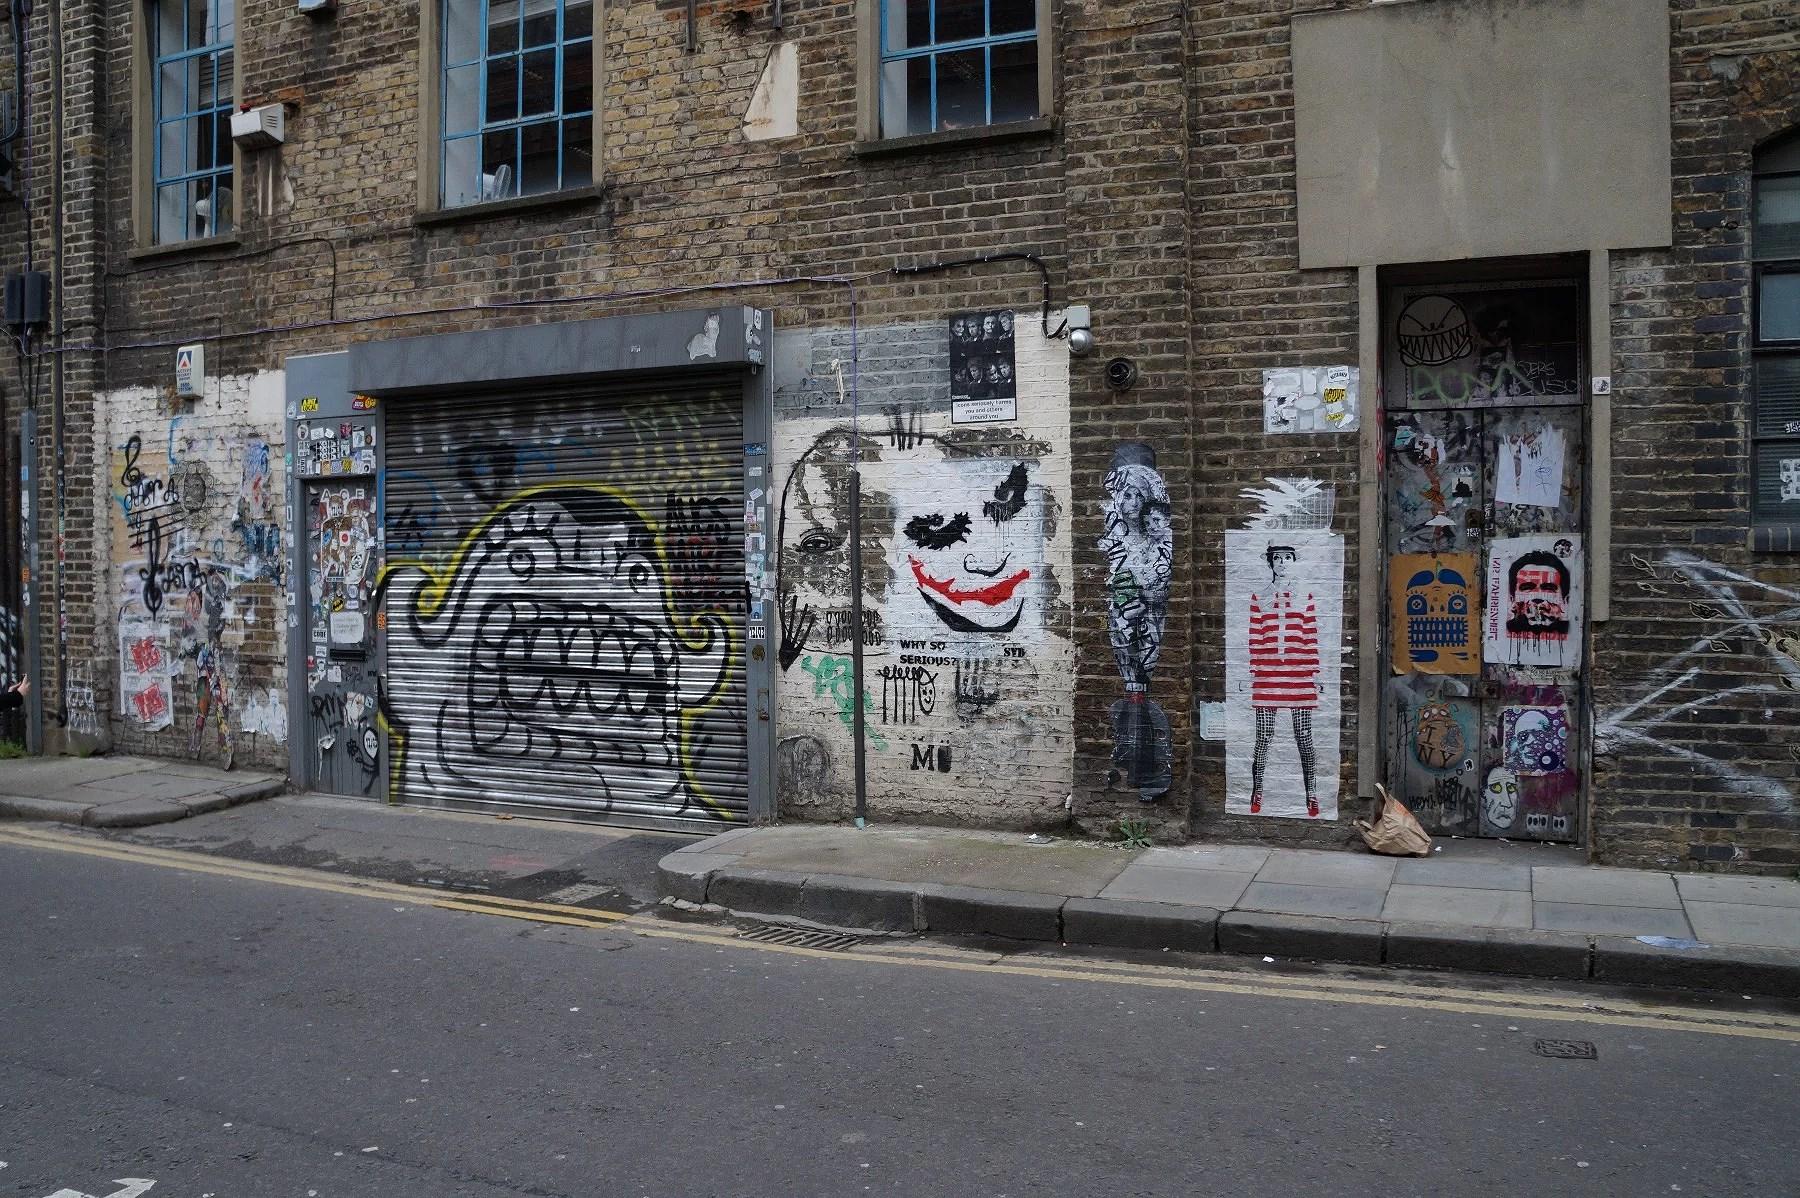 London - systemkameran